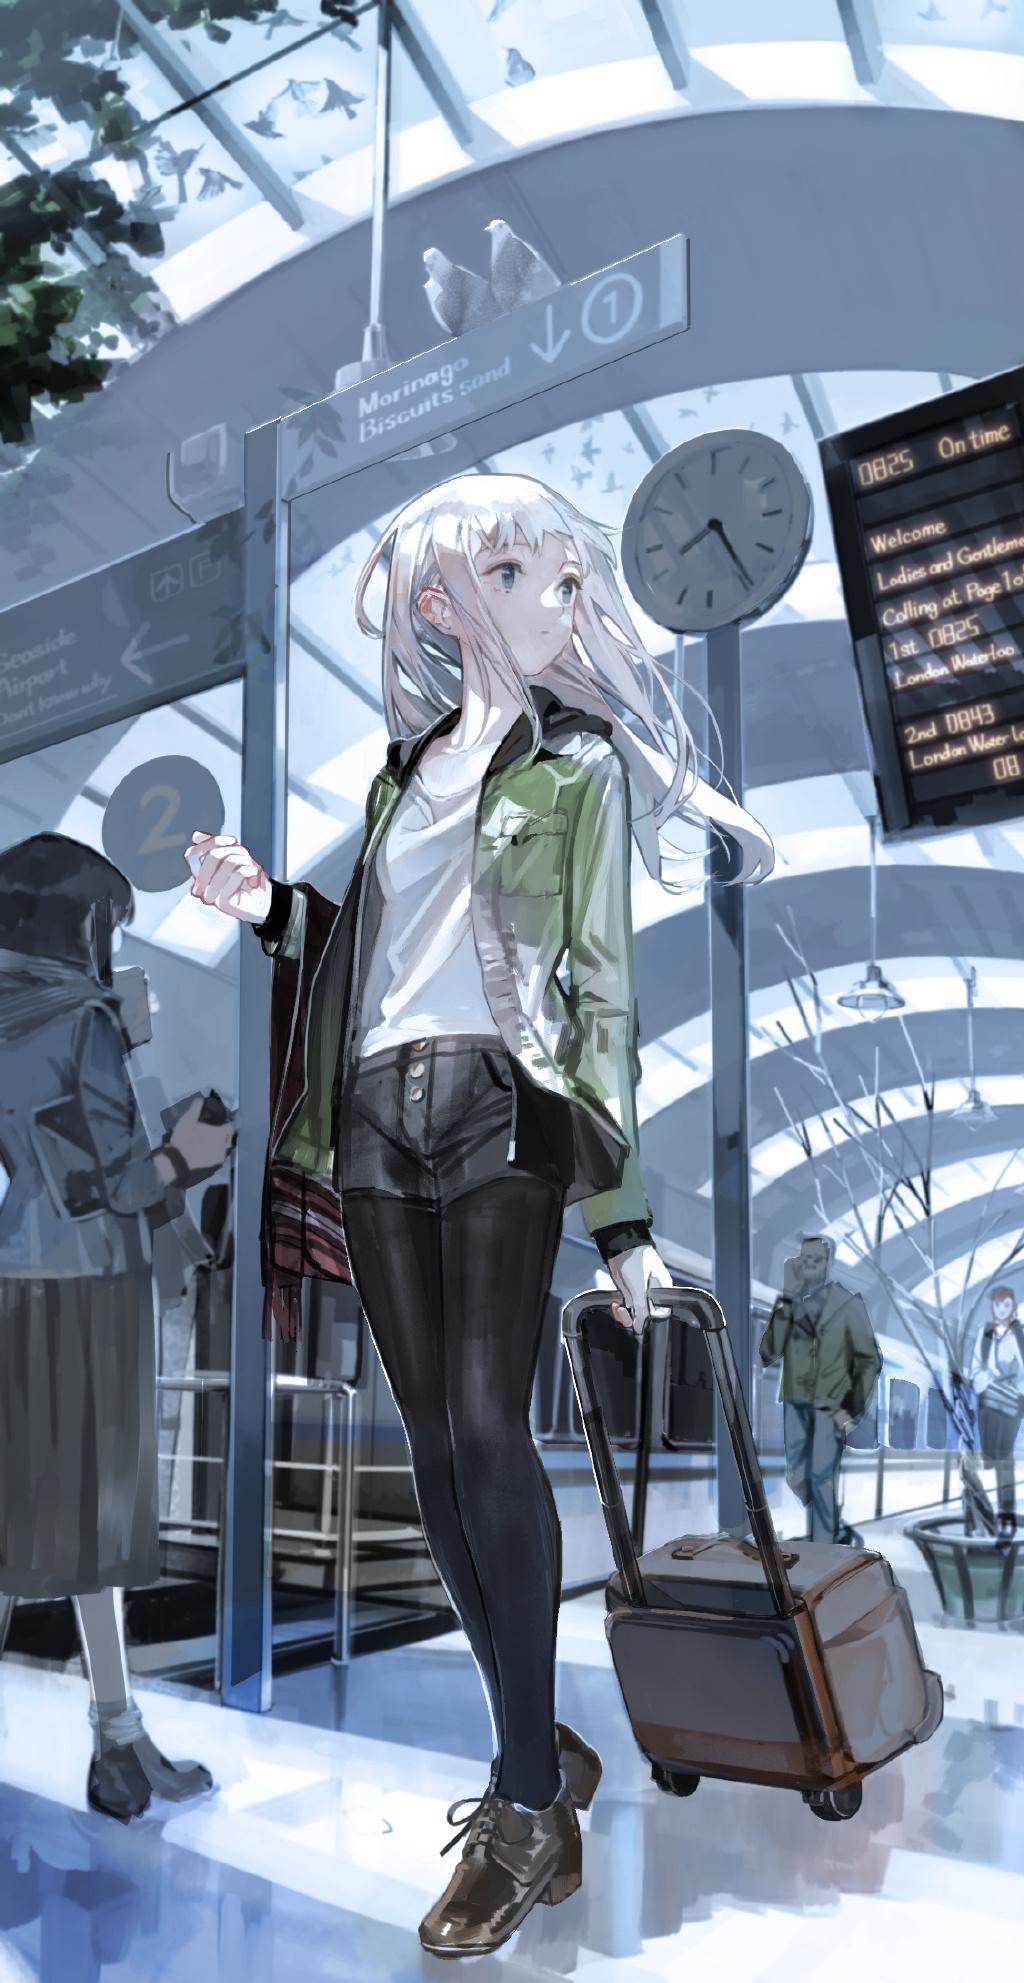 【P站画师】清爽可爱的女孩子们!日本画师あすぱら的插画作品- ACG17.COM